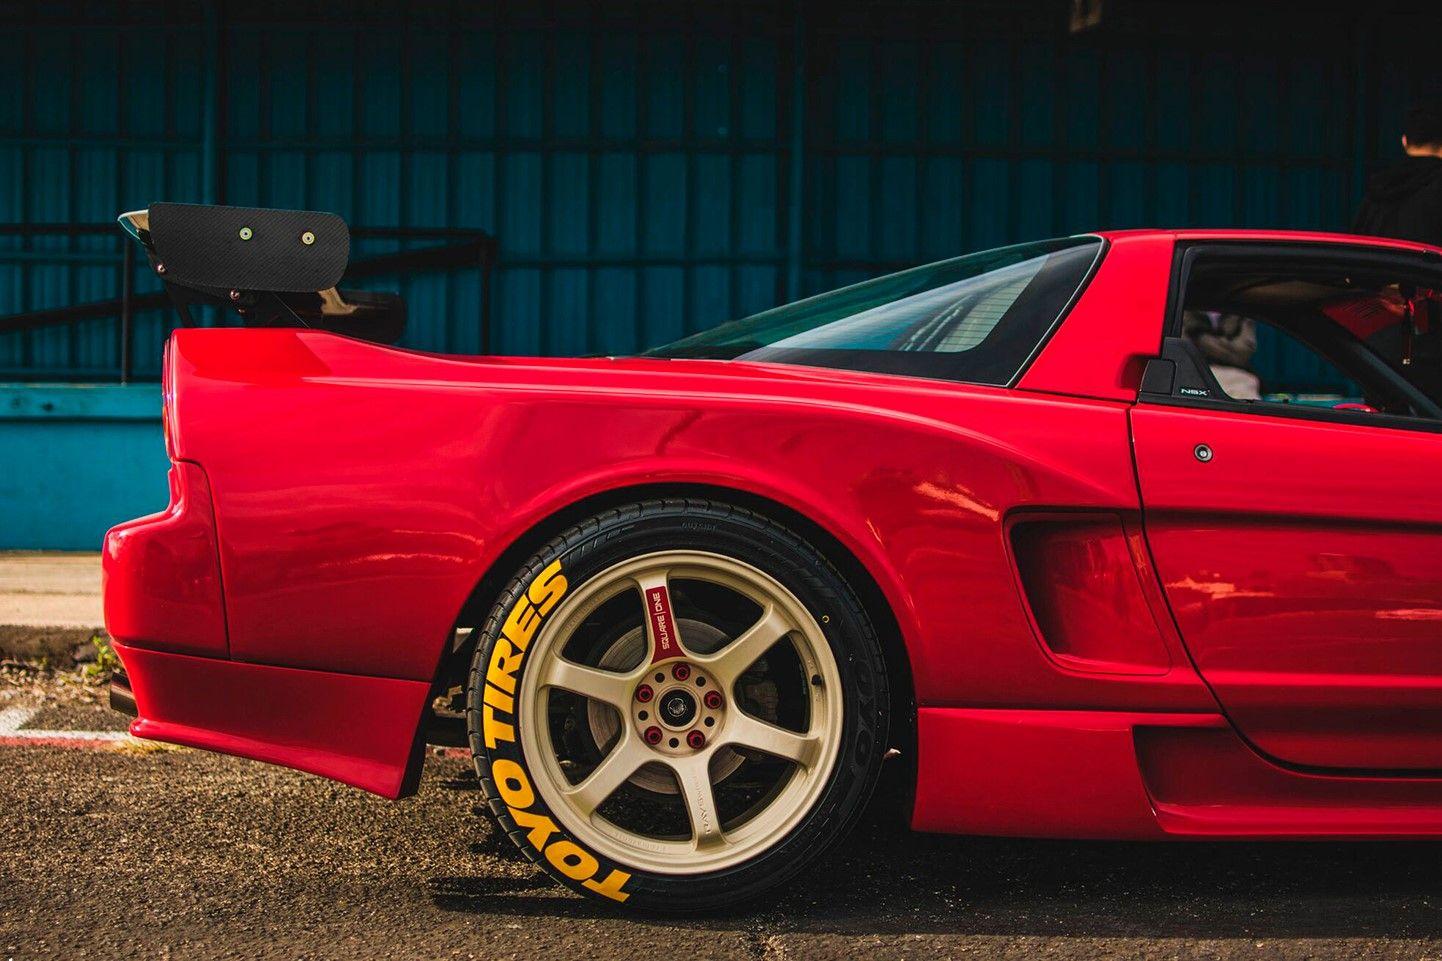 Toyo Proxes T1S tyres